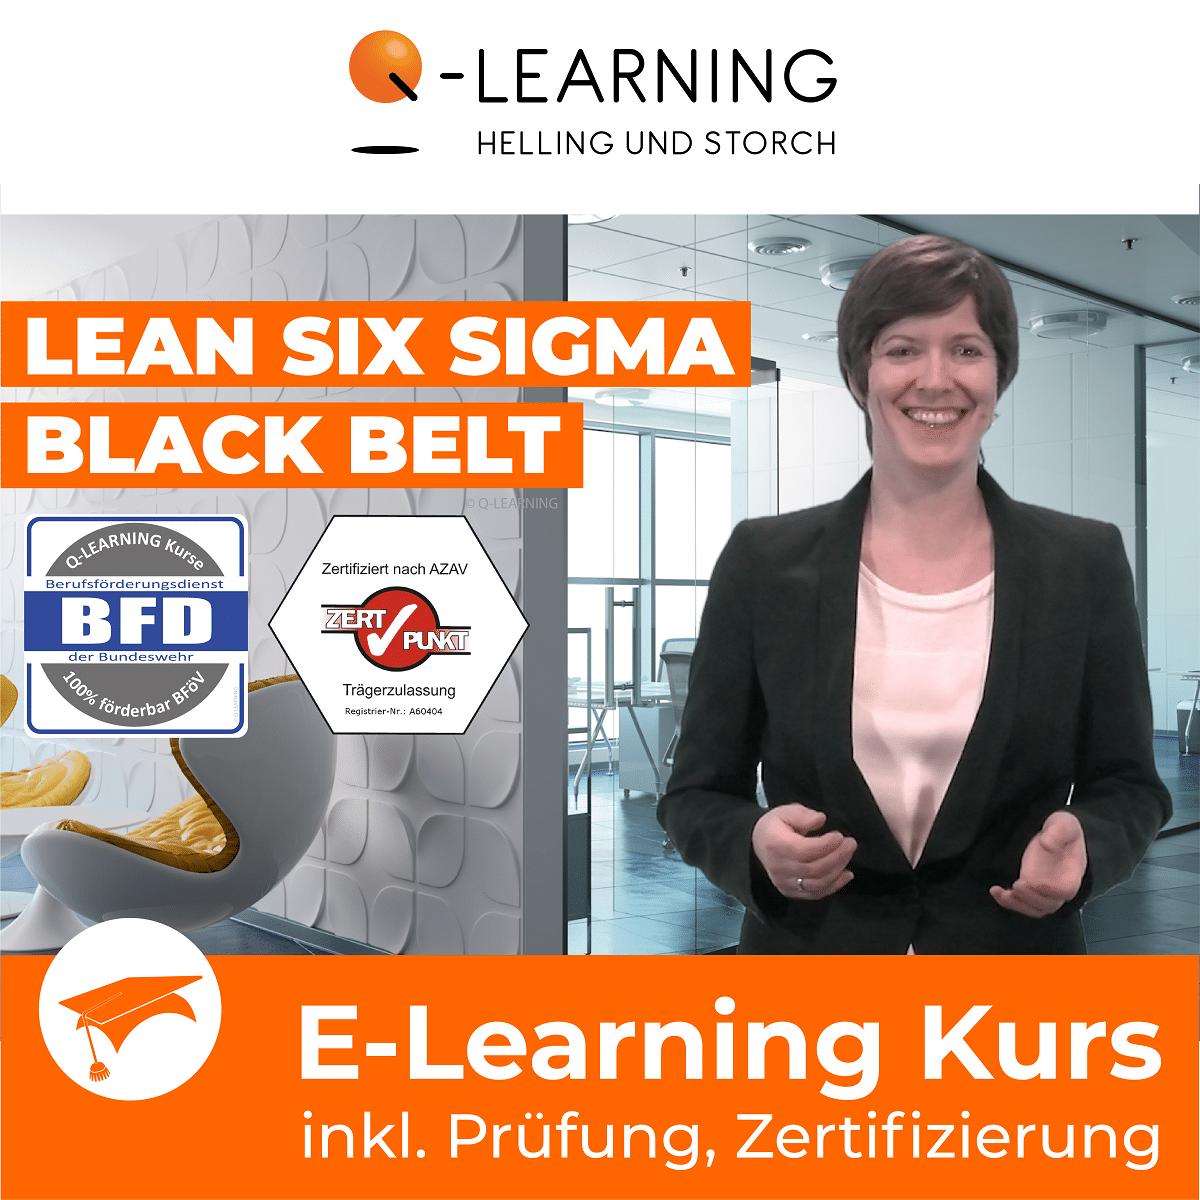 Produktbild LEAN +SIX SIGMA BLACK BELT | BFD